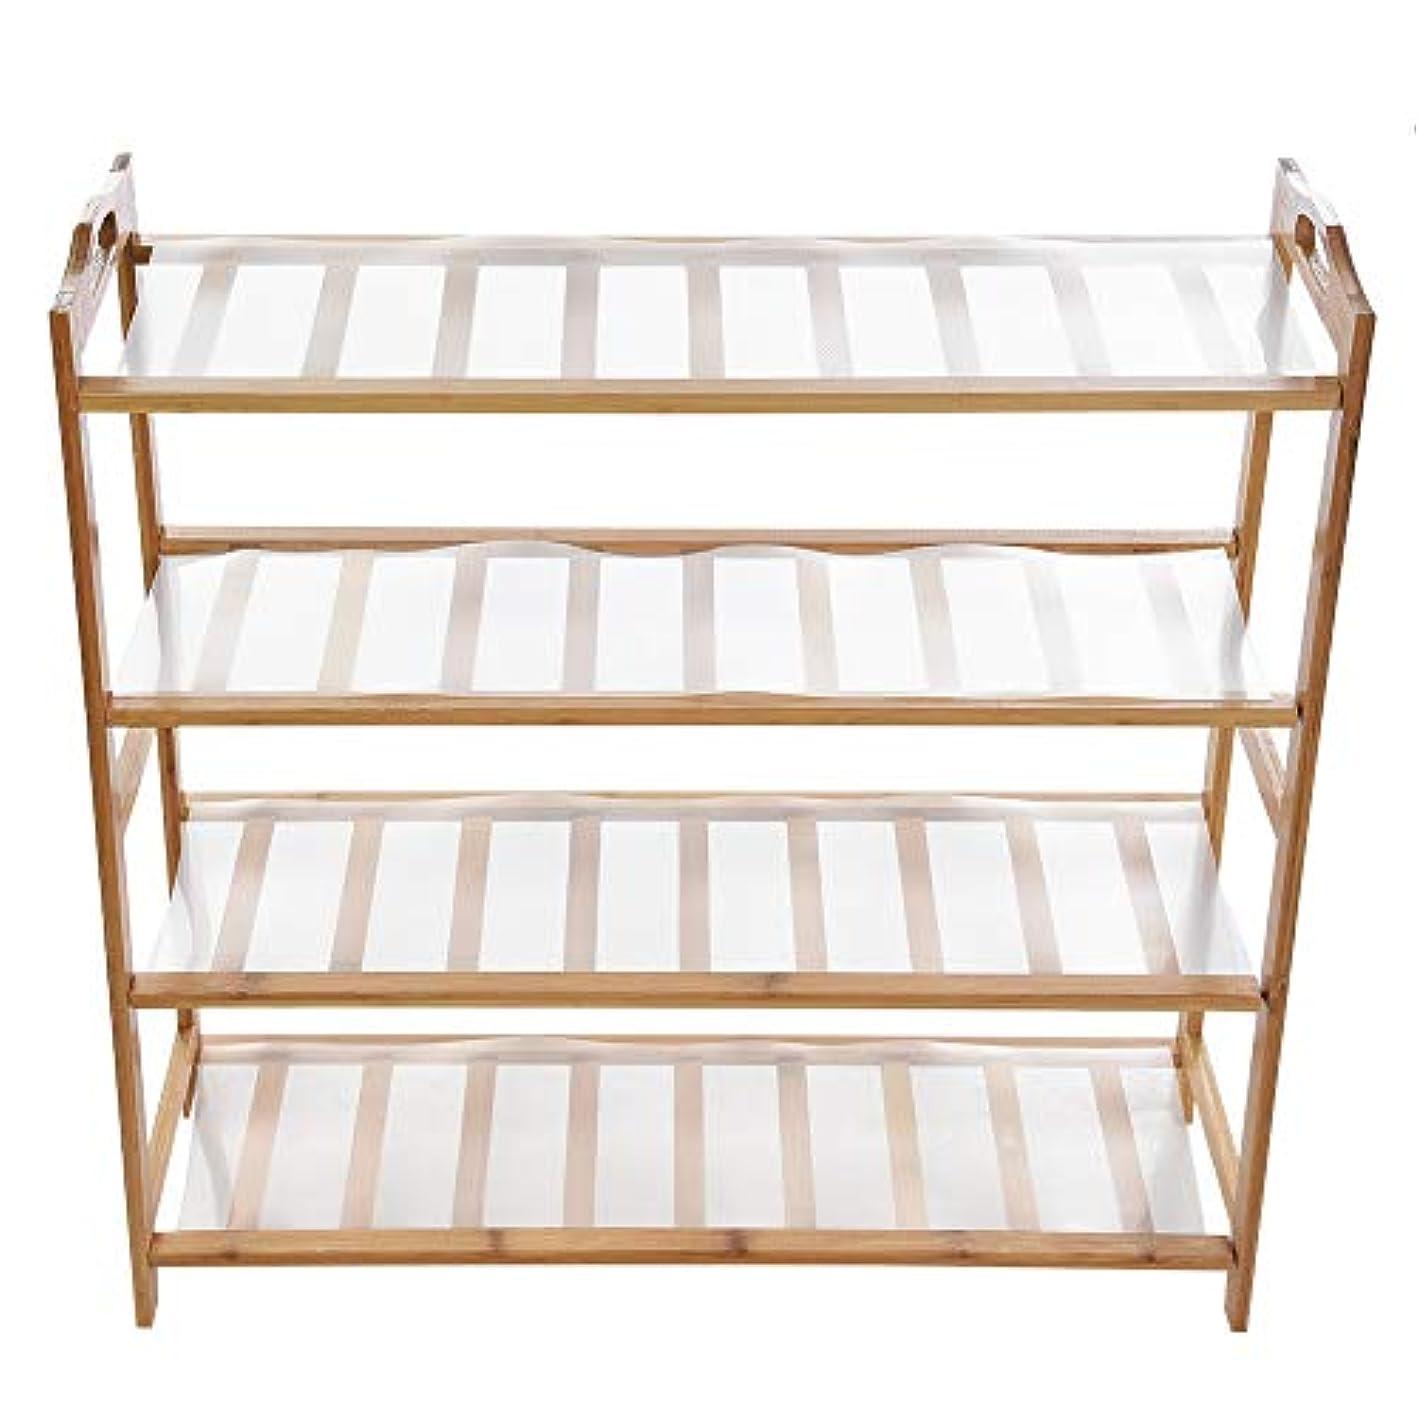 Nopeak Bamboo Shoe Rack 4-Tier Shoe Shelf Storage Organizer Ideal for Hallway Bathroom